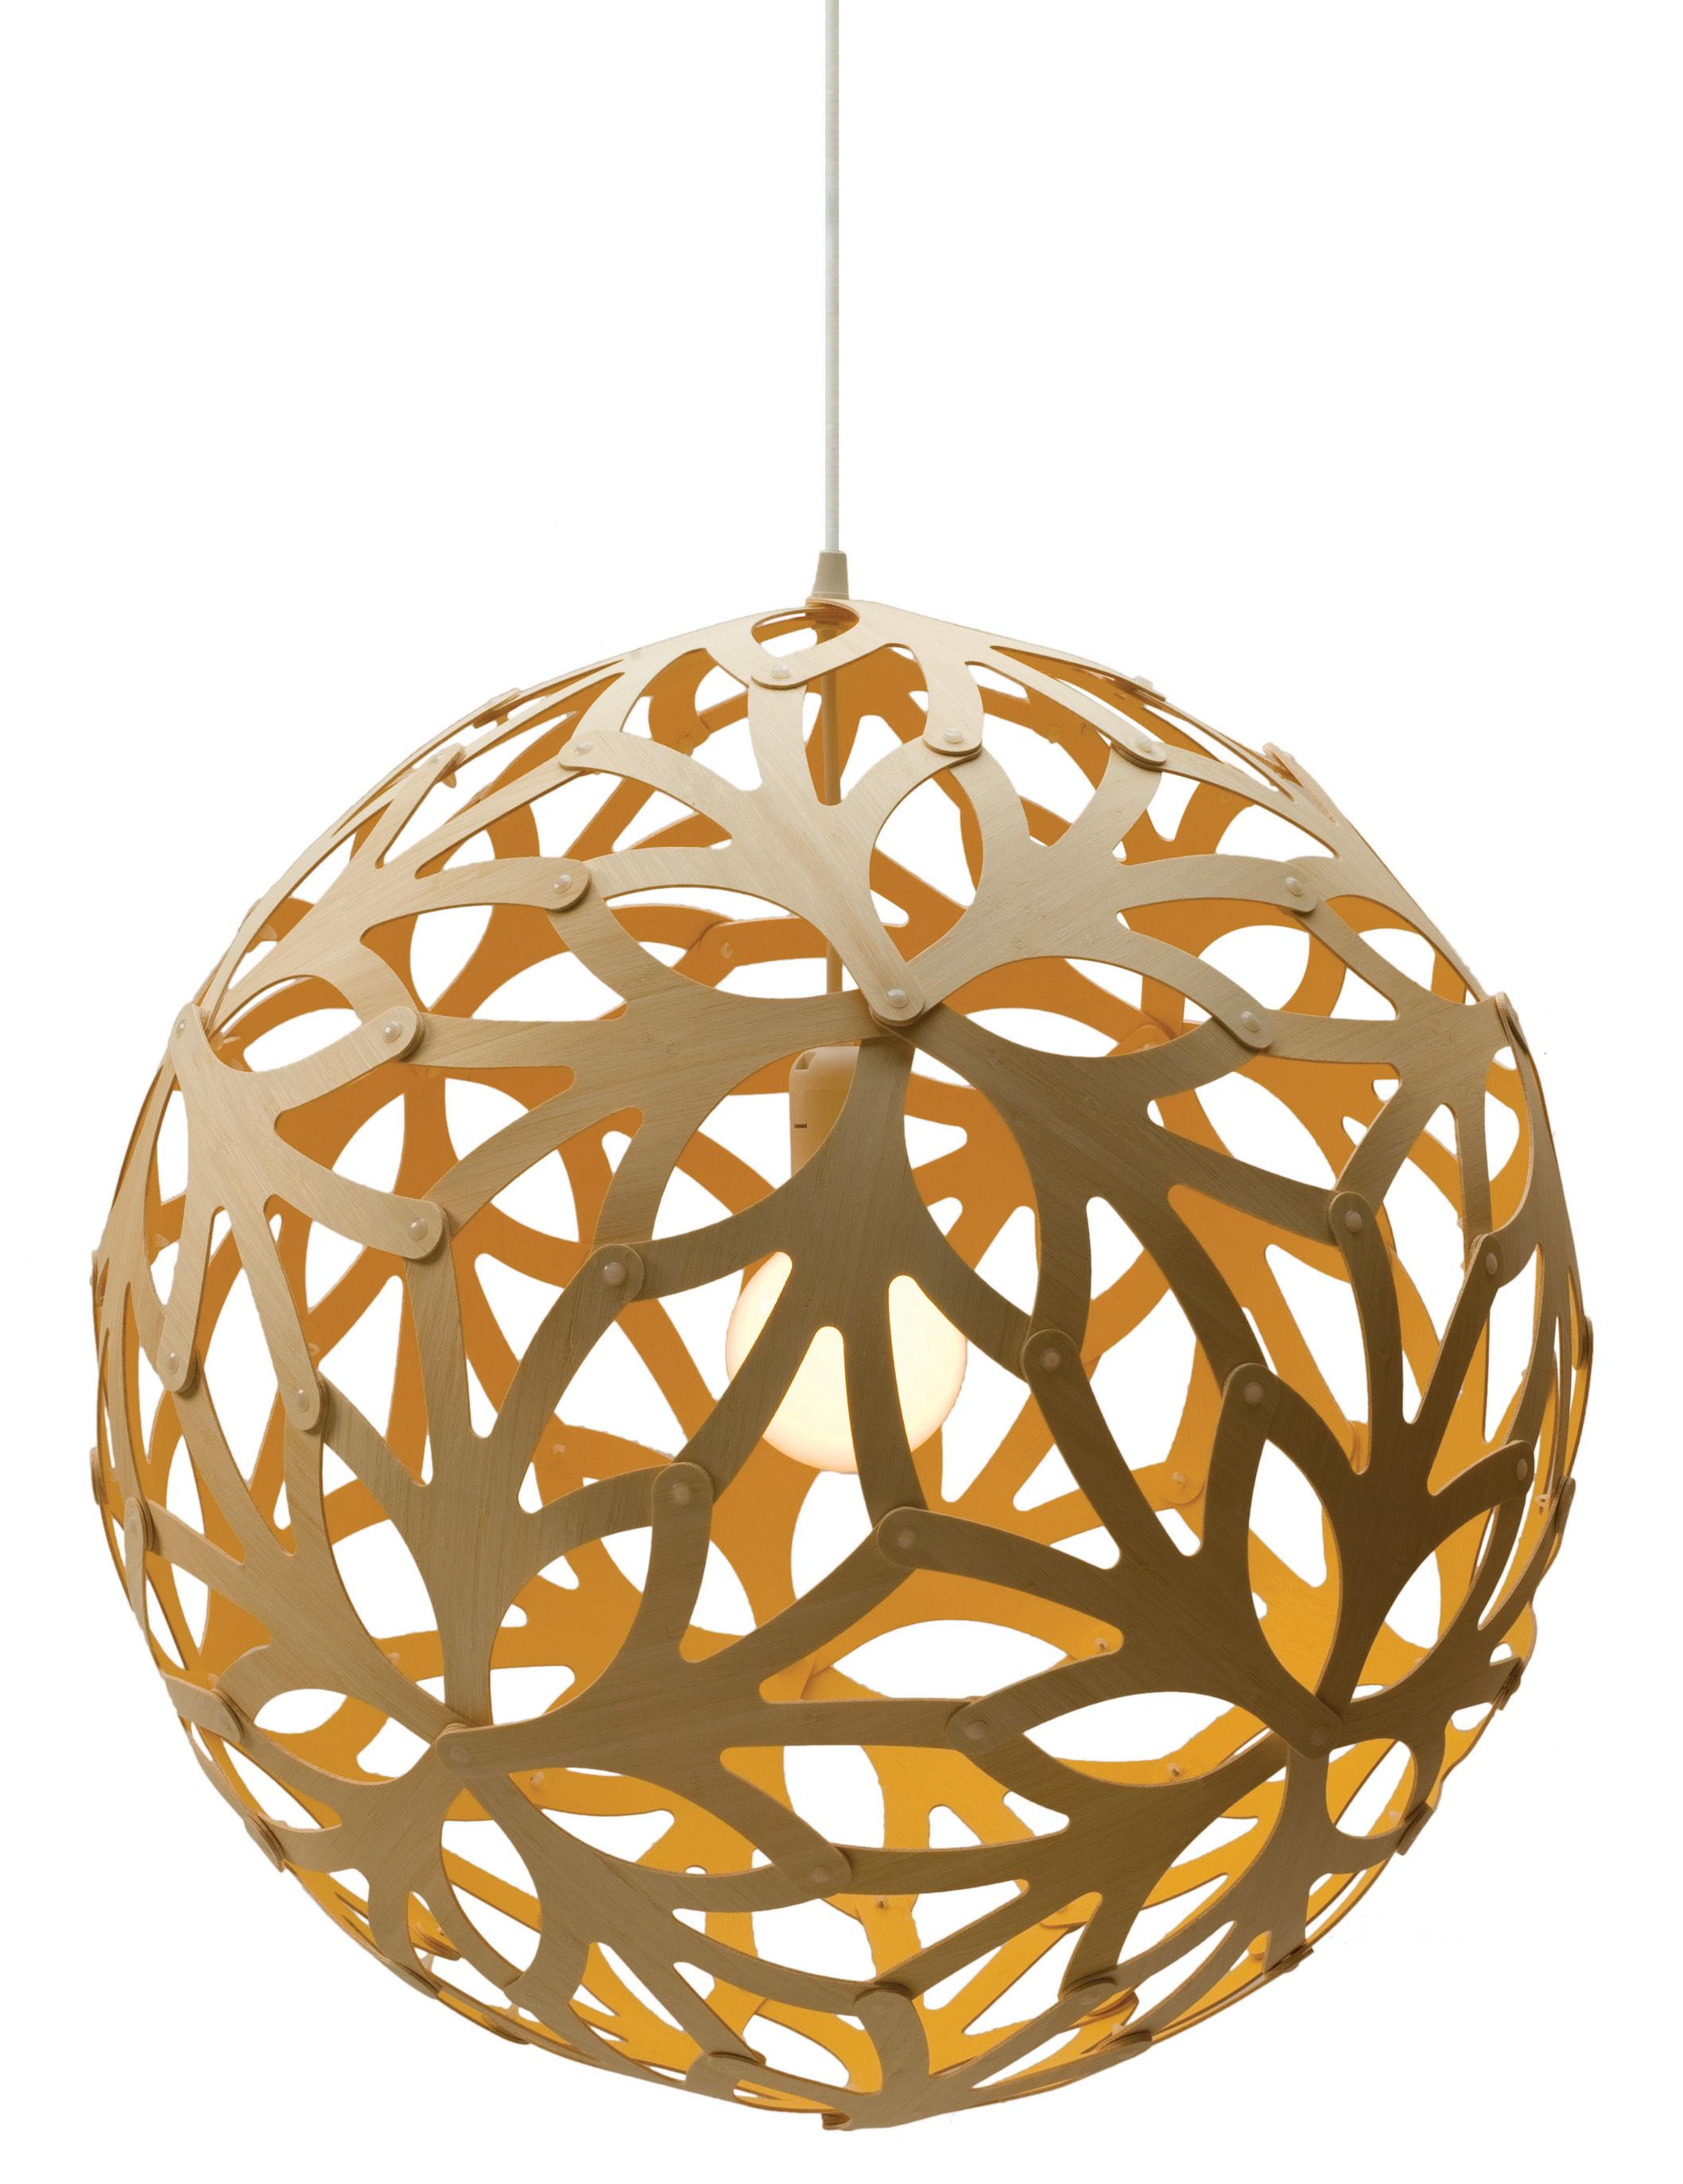 Lighting - Pendant Lighting - Floral Pendant - Ø 60 cm - Bicoloured by David Trubridge - Yellow / Natural wood - Pine